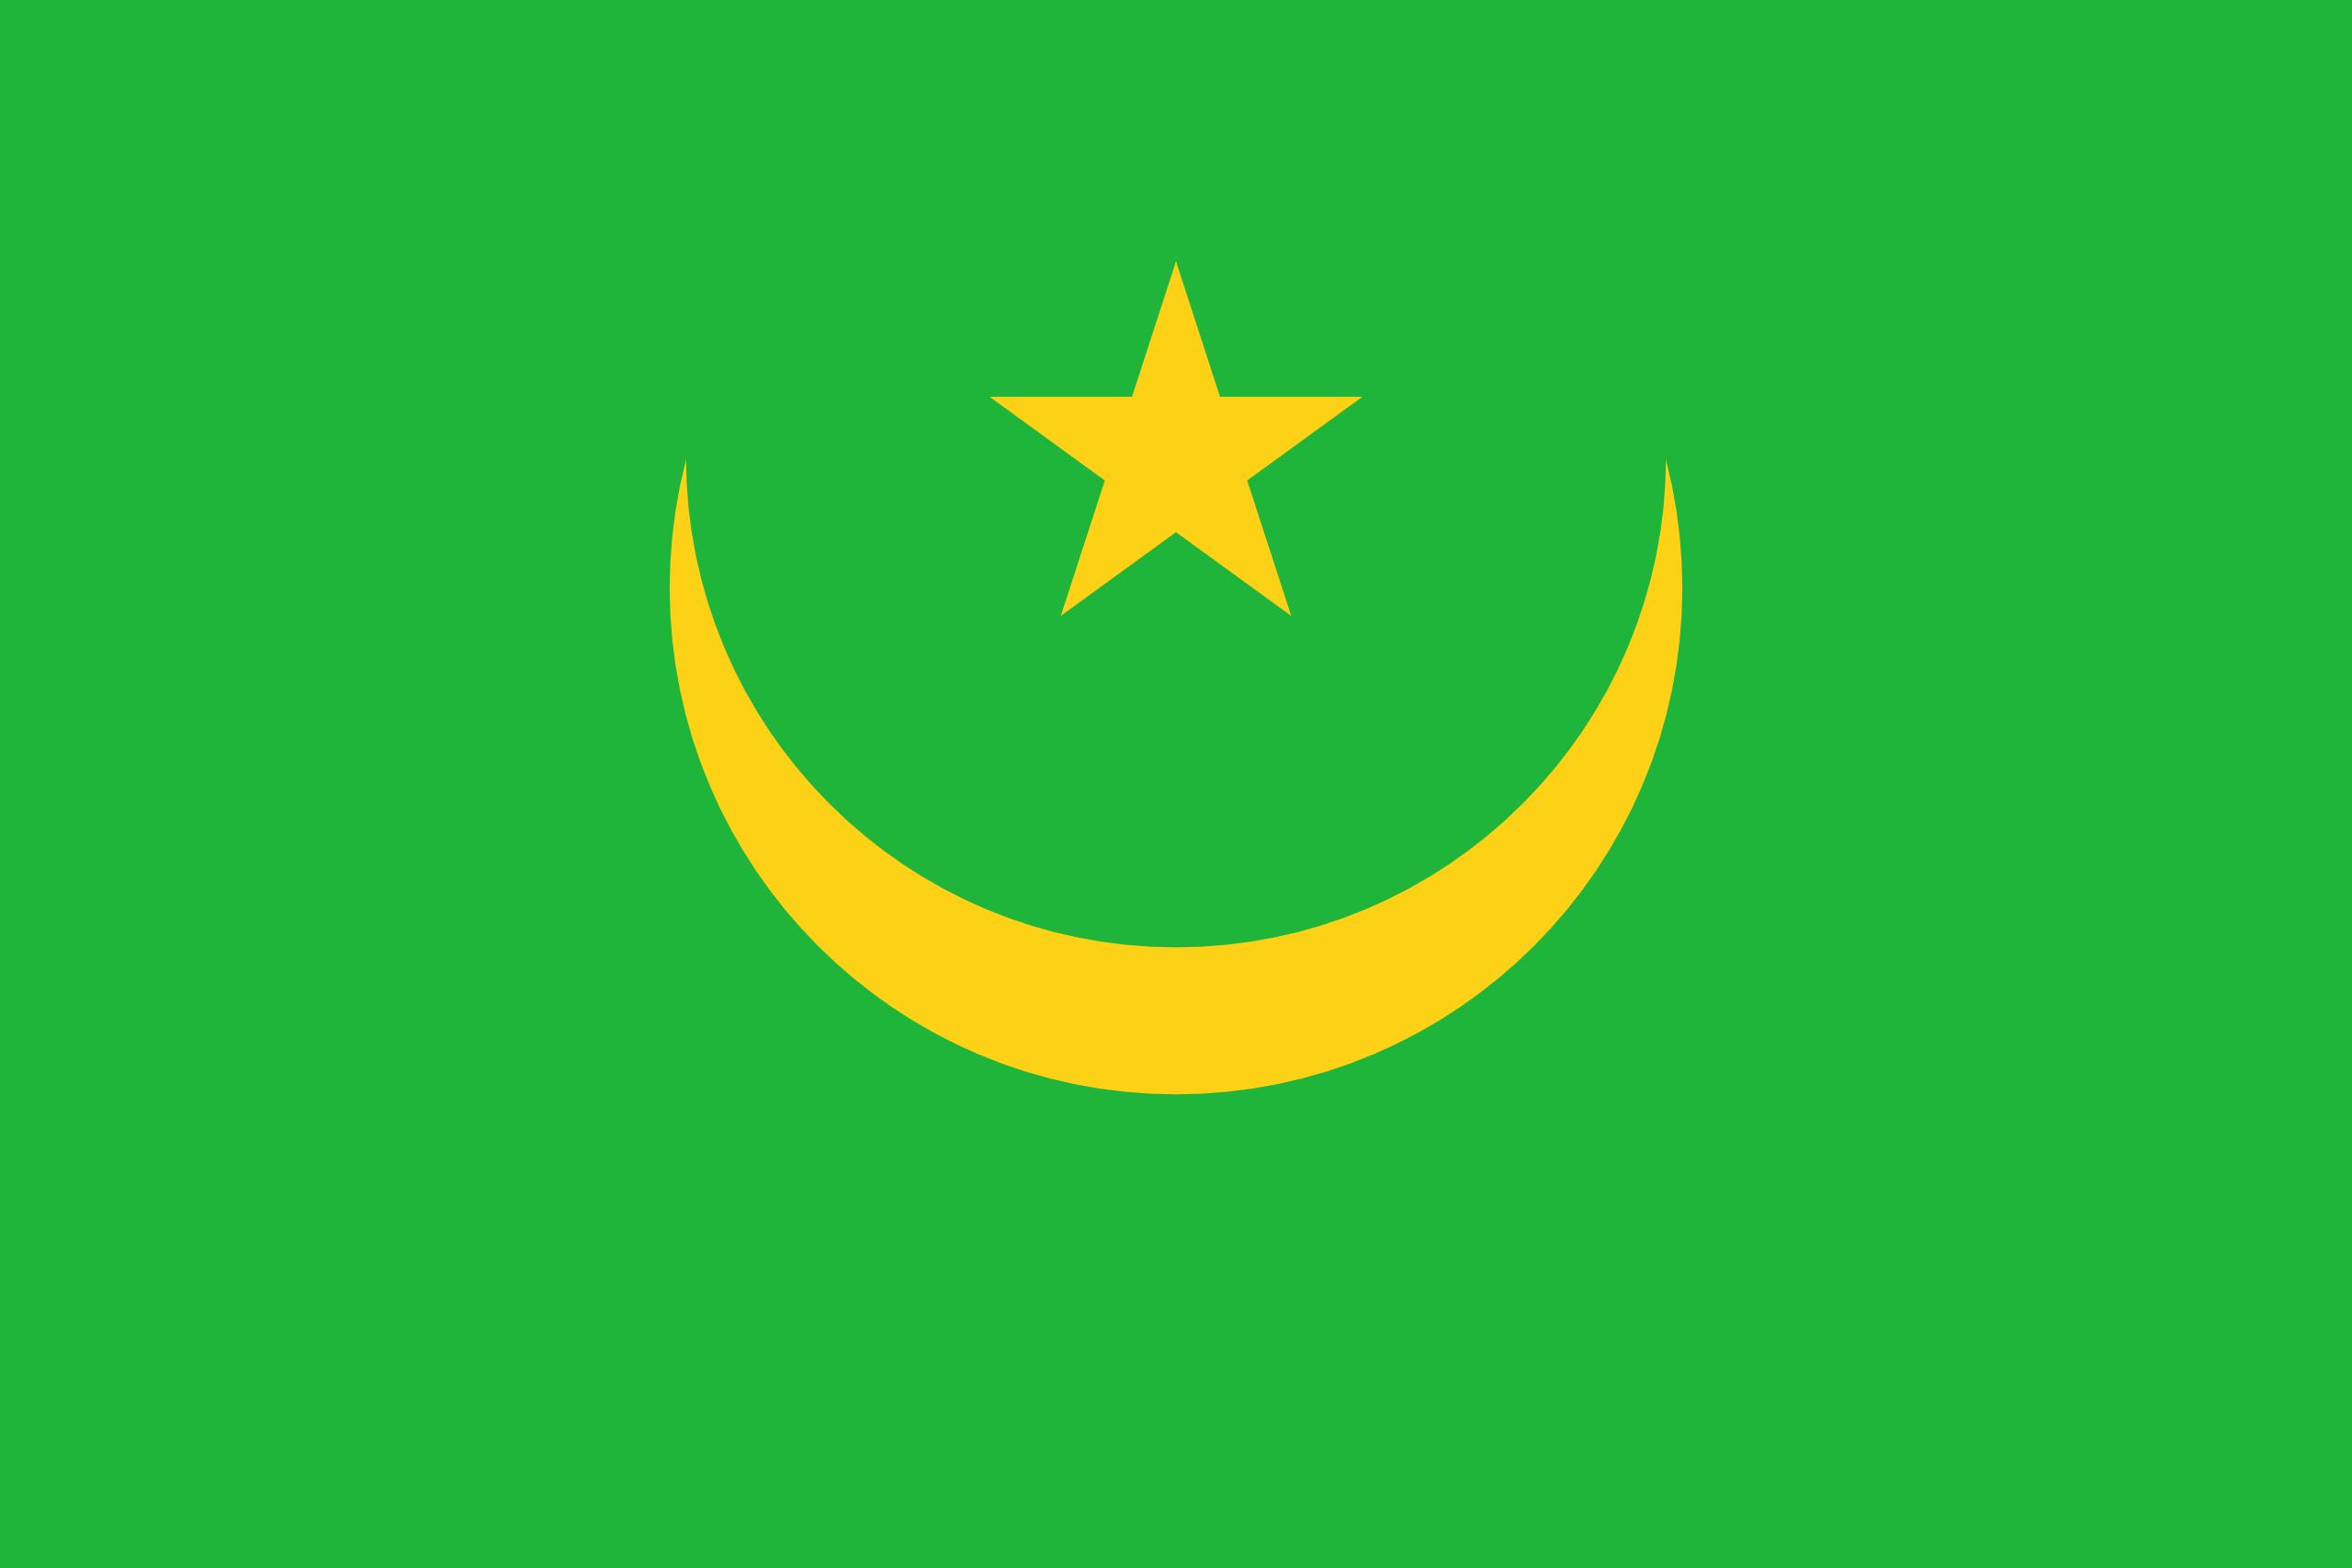 mauritania, देश, emblema, लोग�प्रतीकbolo - HD वॉलपेपर - प्रोफेसर-falken.com